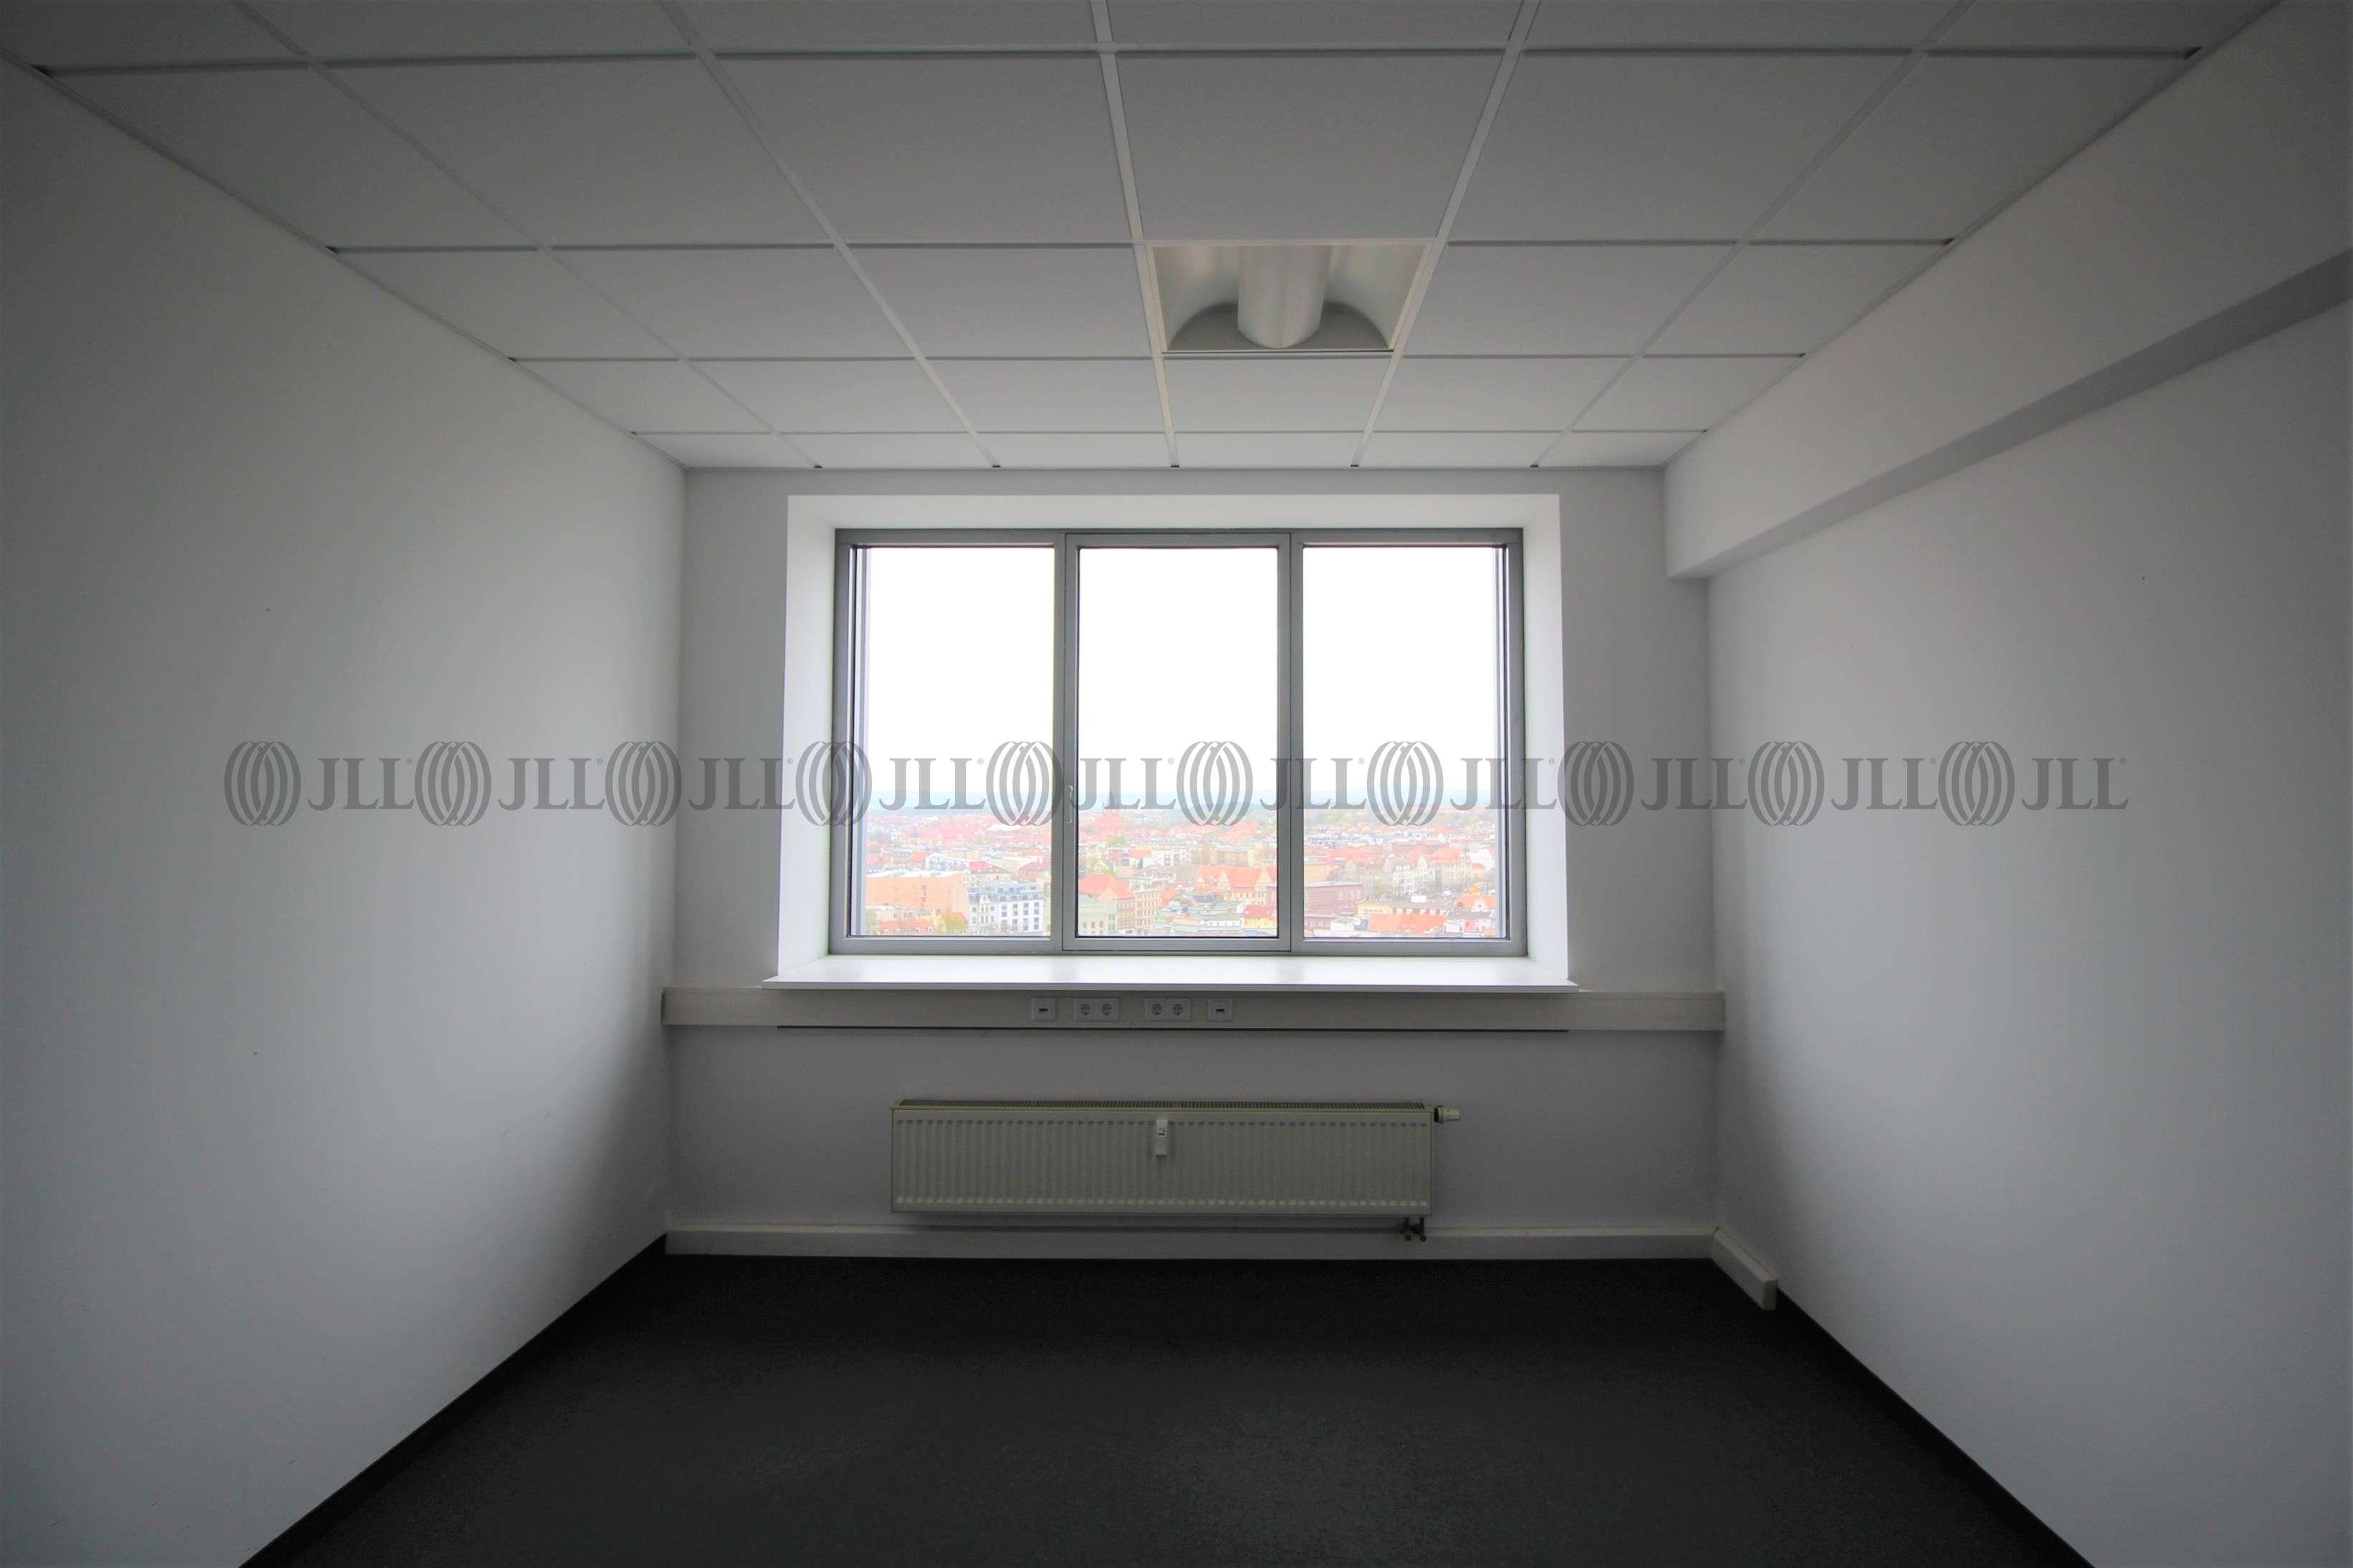 Büros Halle (saale), 06112 - Büro - Halle (Saale), Innenstadt - B1699 - 10080735